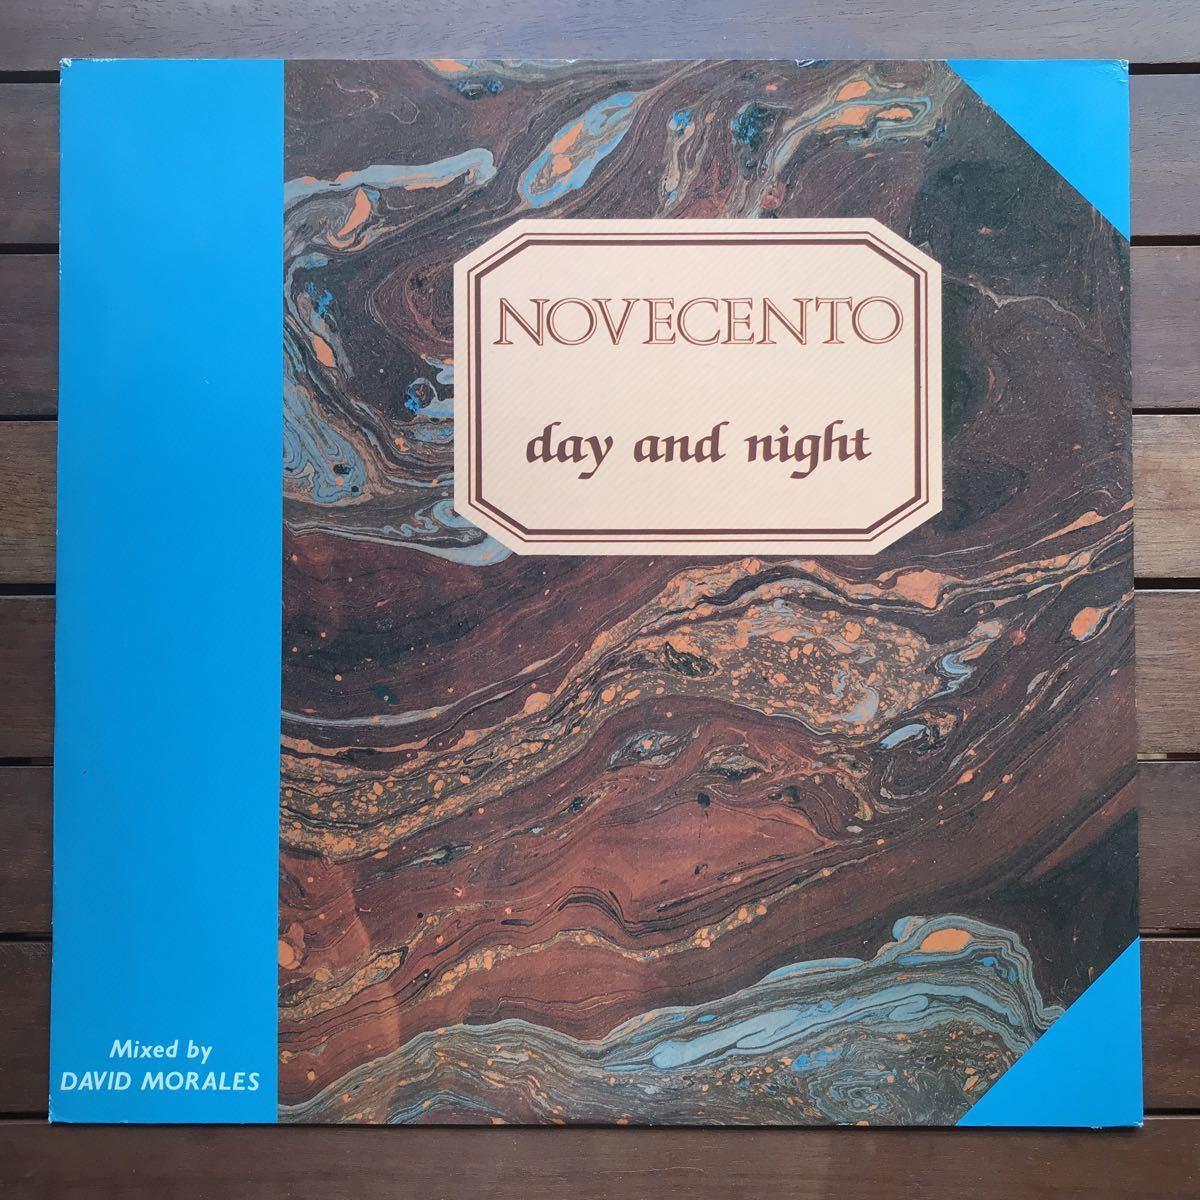 ●【r&b】Novecento / Day And Night[12inch]オリジナル盤《2-1-49 9595》